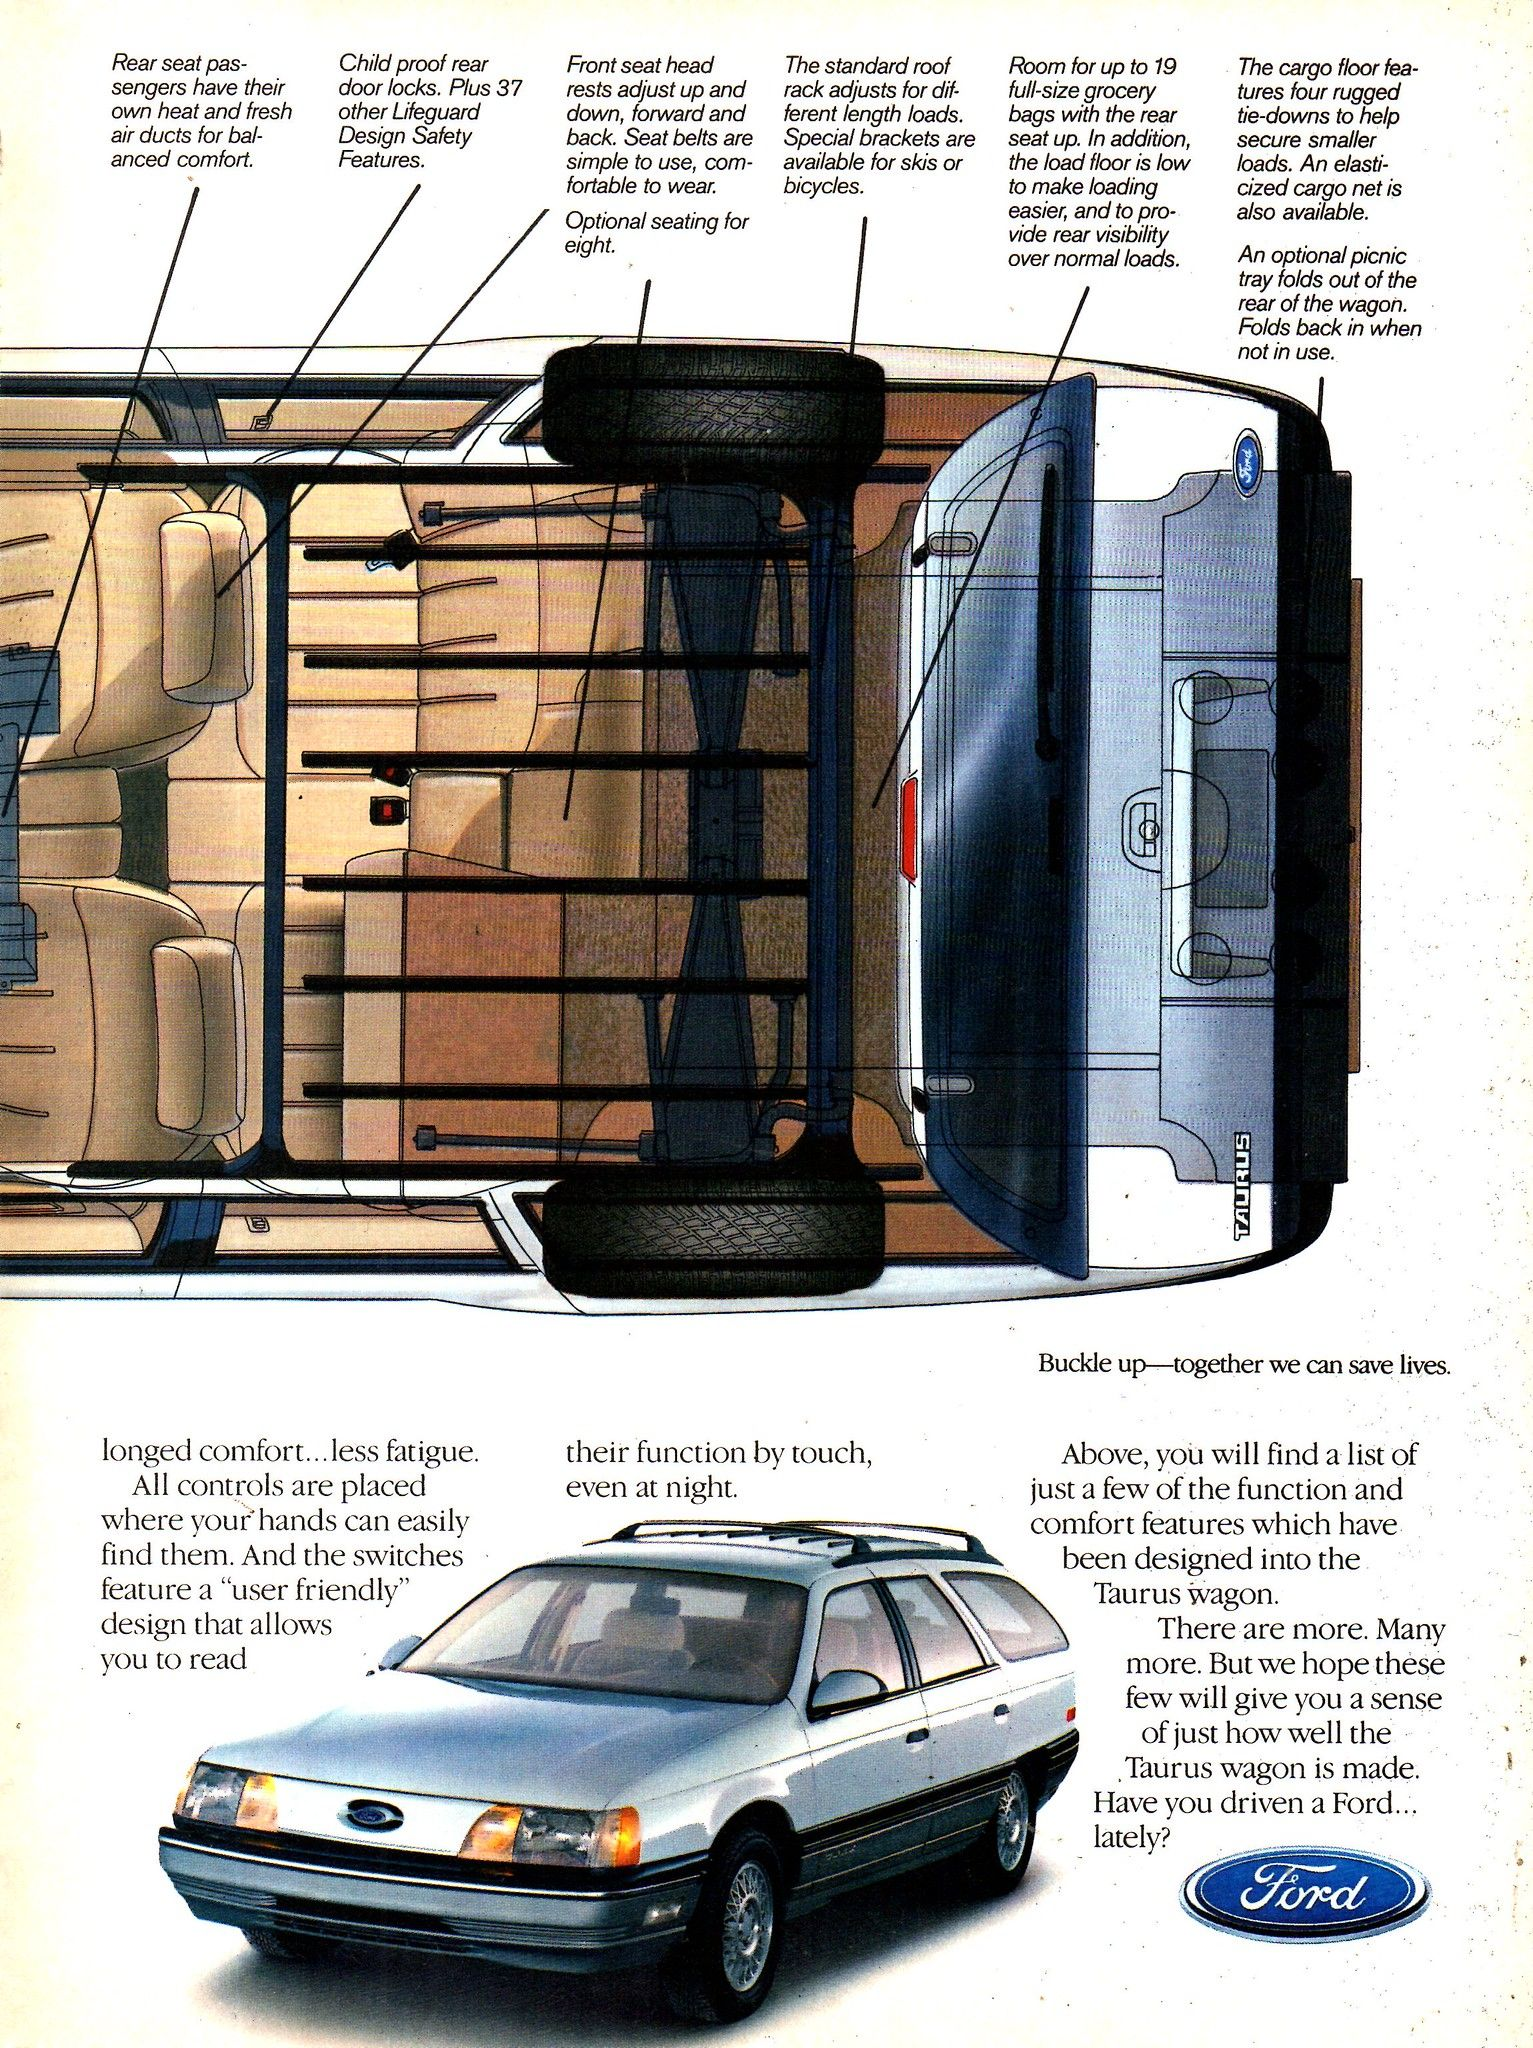 1998 1999 2000 2001 2002 Isuzu Rodeo Interior Driver Door Handle 8 97394 049 0 Chevy Trucks Chevy Trucks